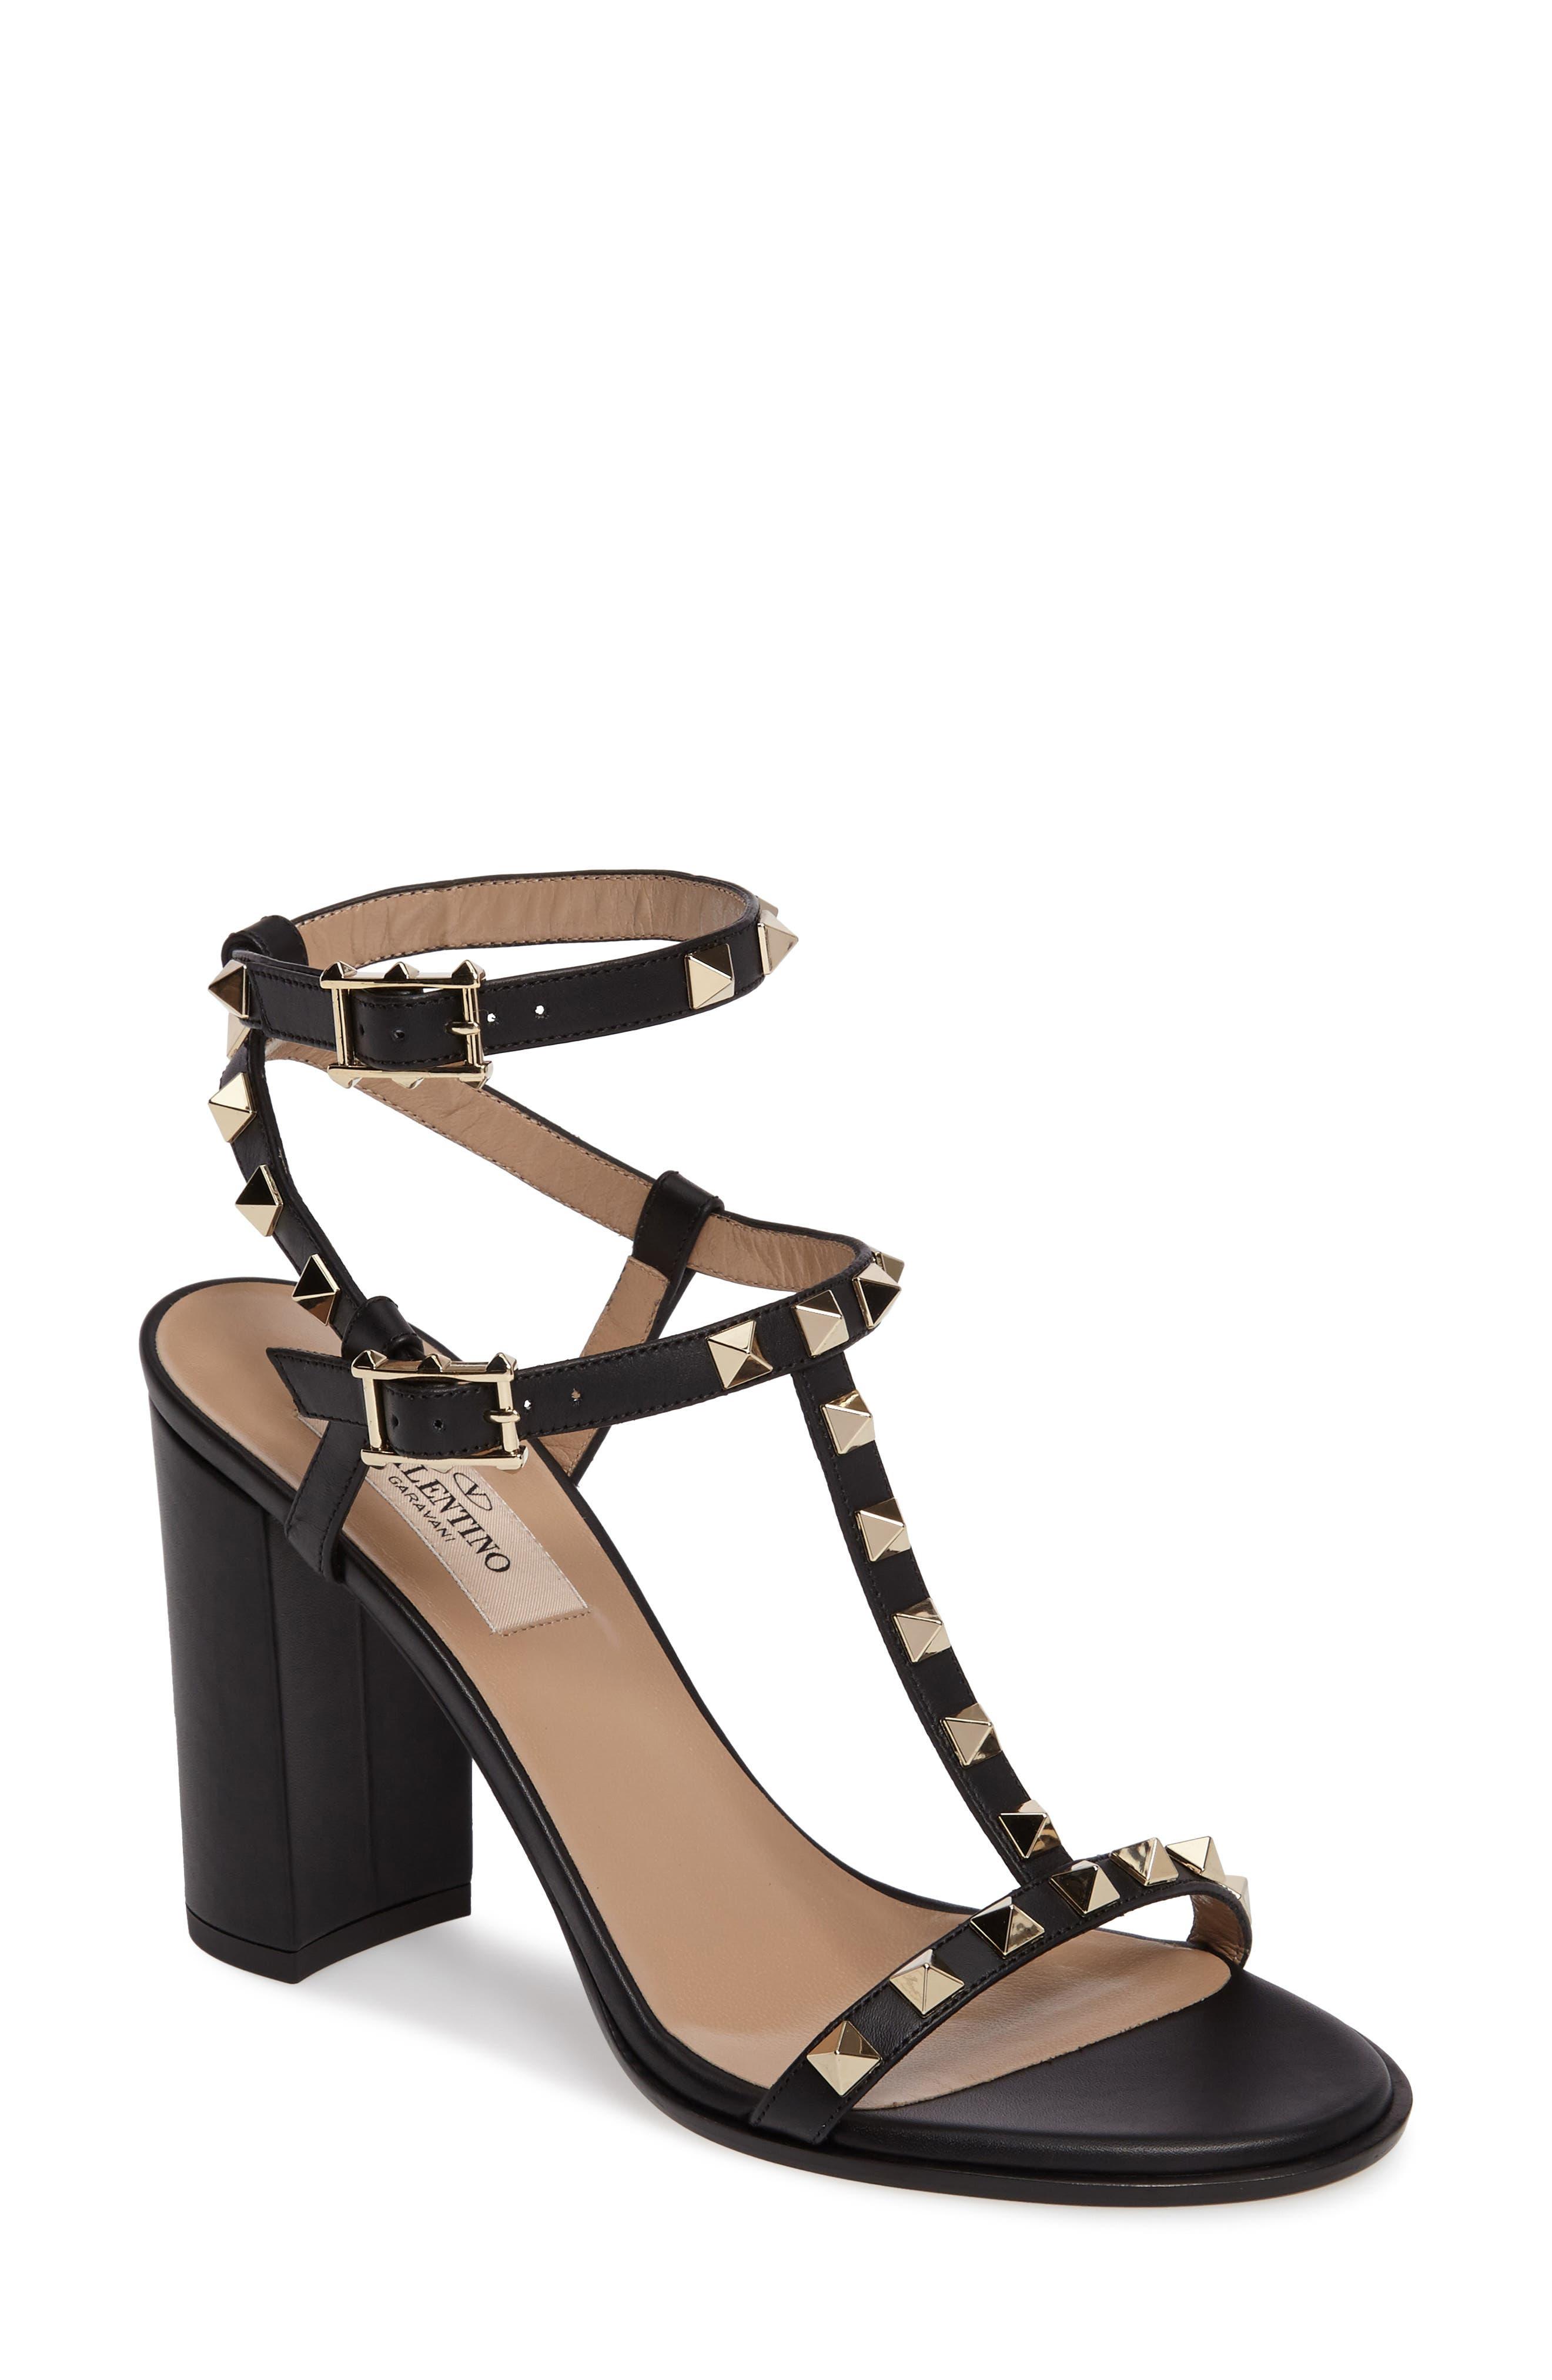 VALENTINO GARAVANI Rockstud Ankle Strap